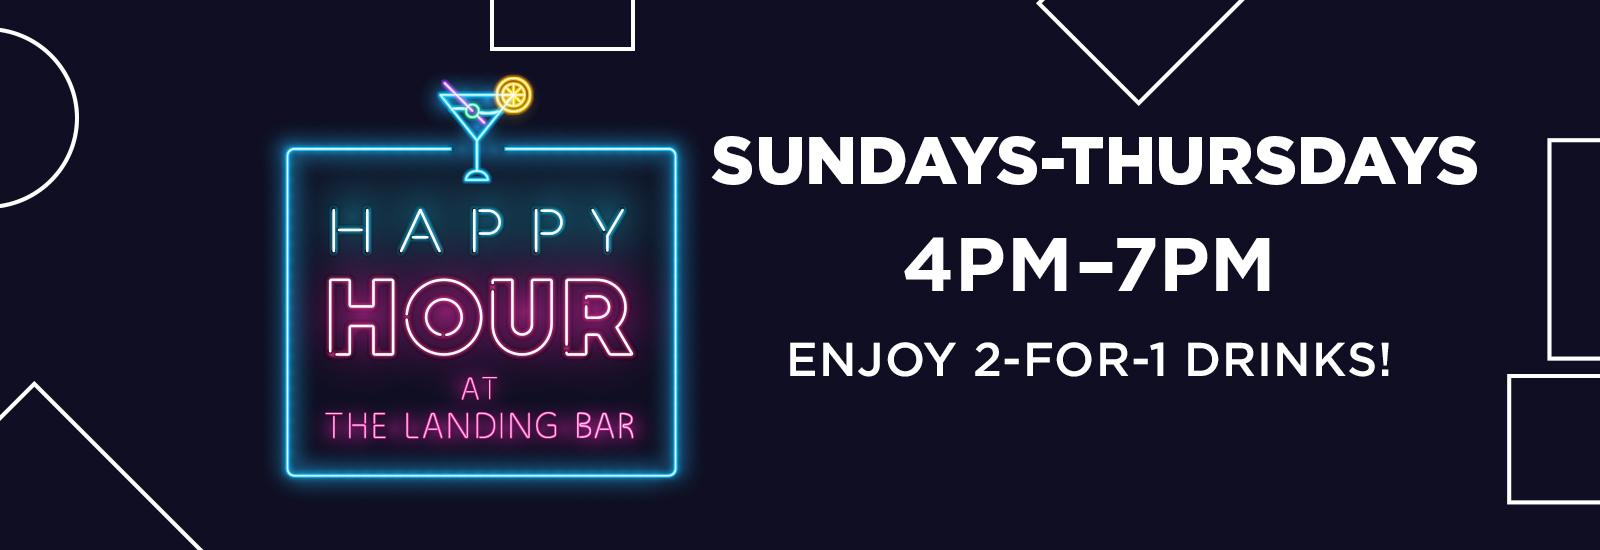 TLH Sunday- Thursday Happy Hour